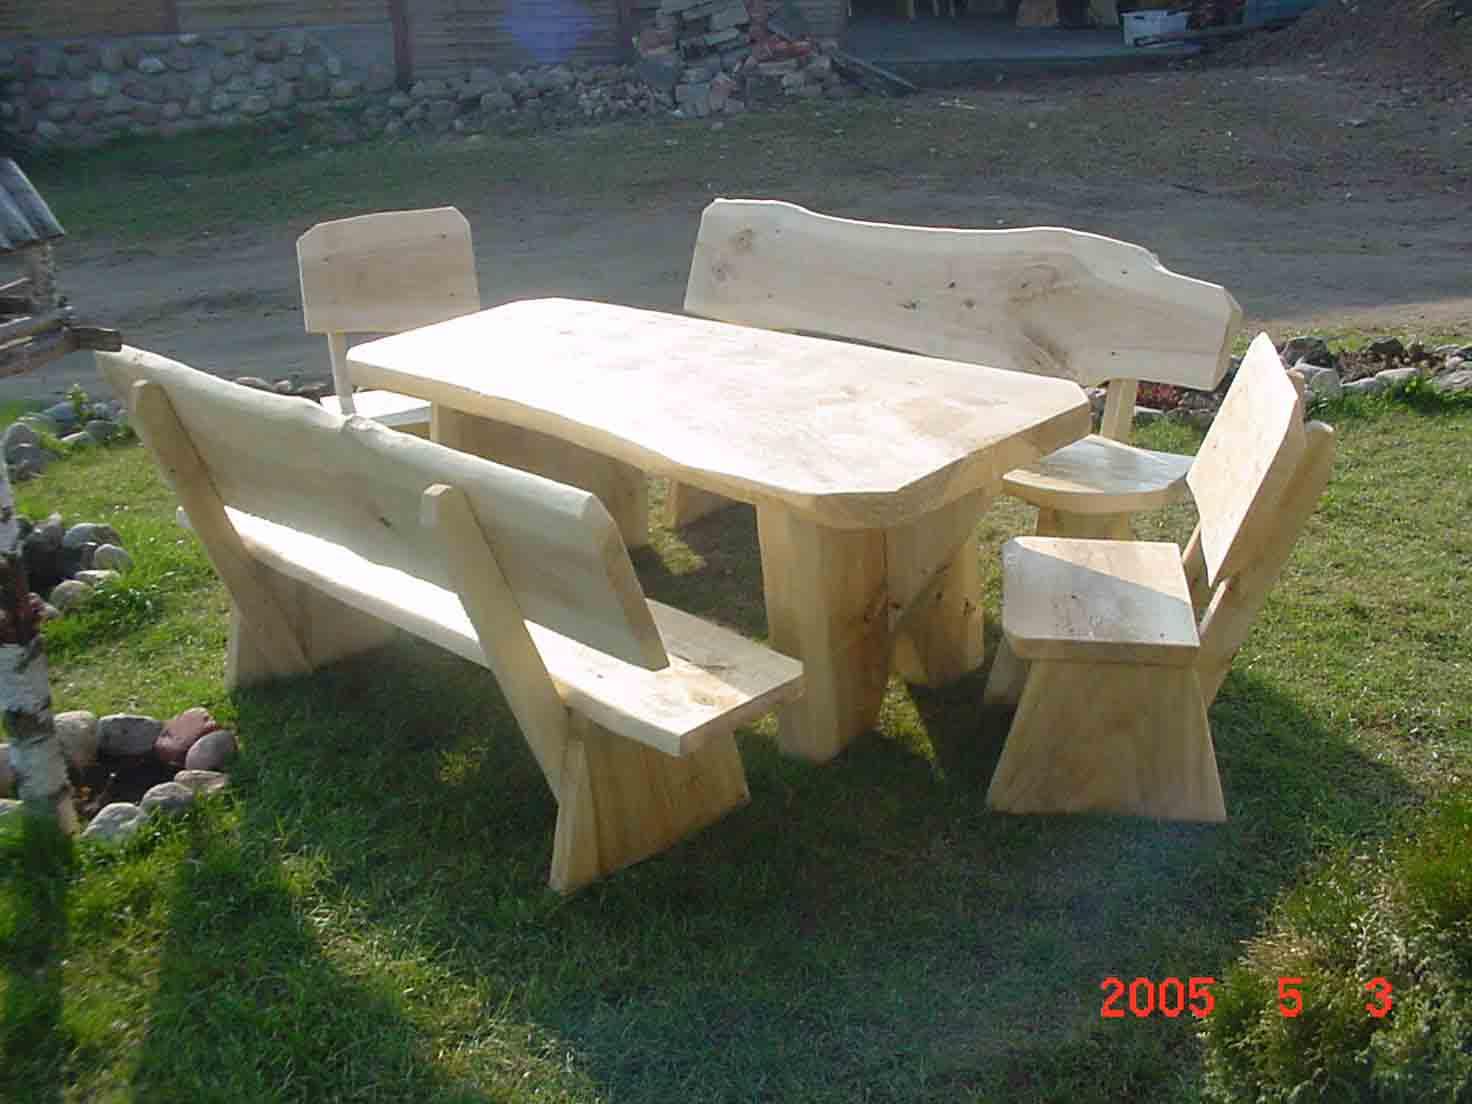 garden set. Garden Set Of Wooden Furniture - Buy Product On Alibaba.com